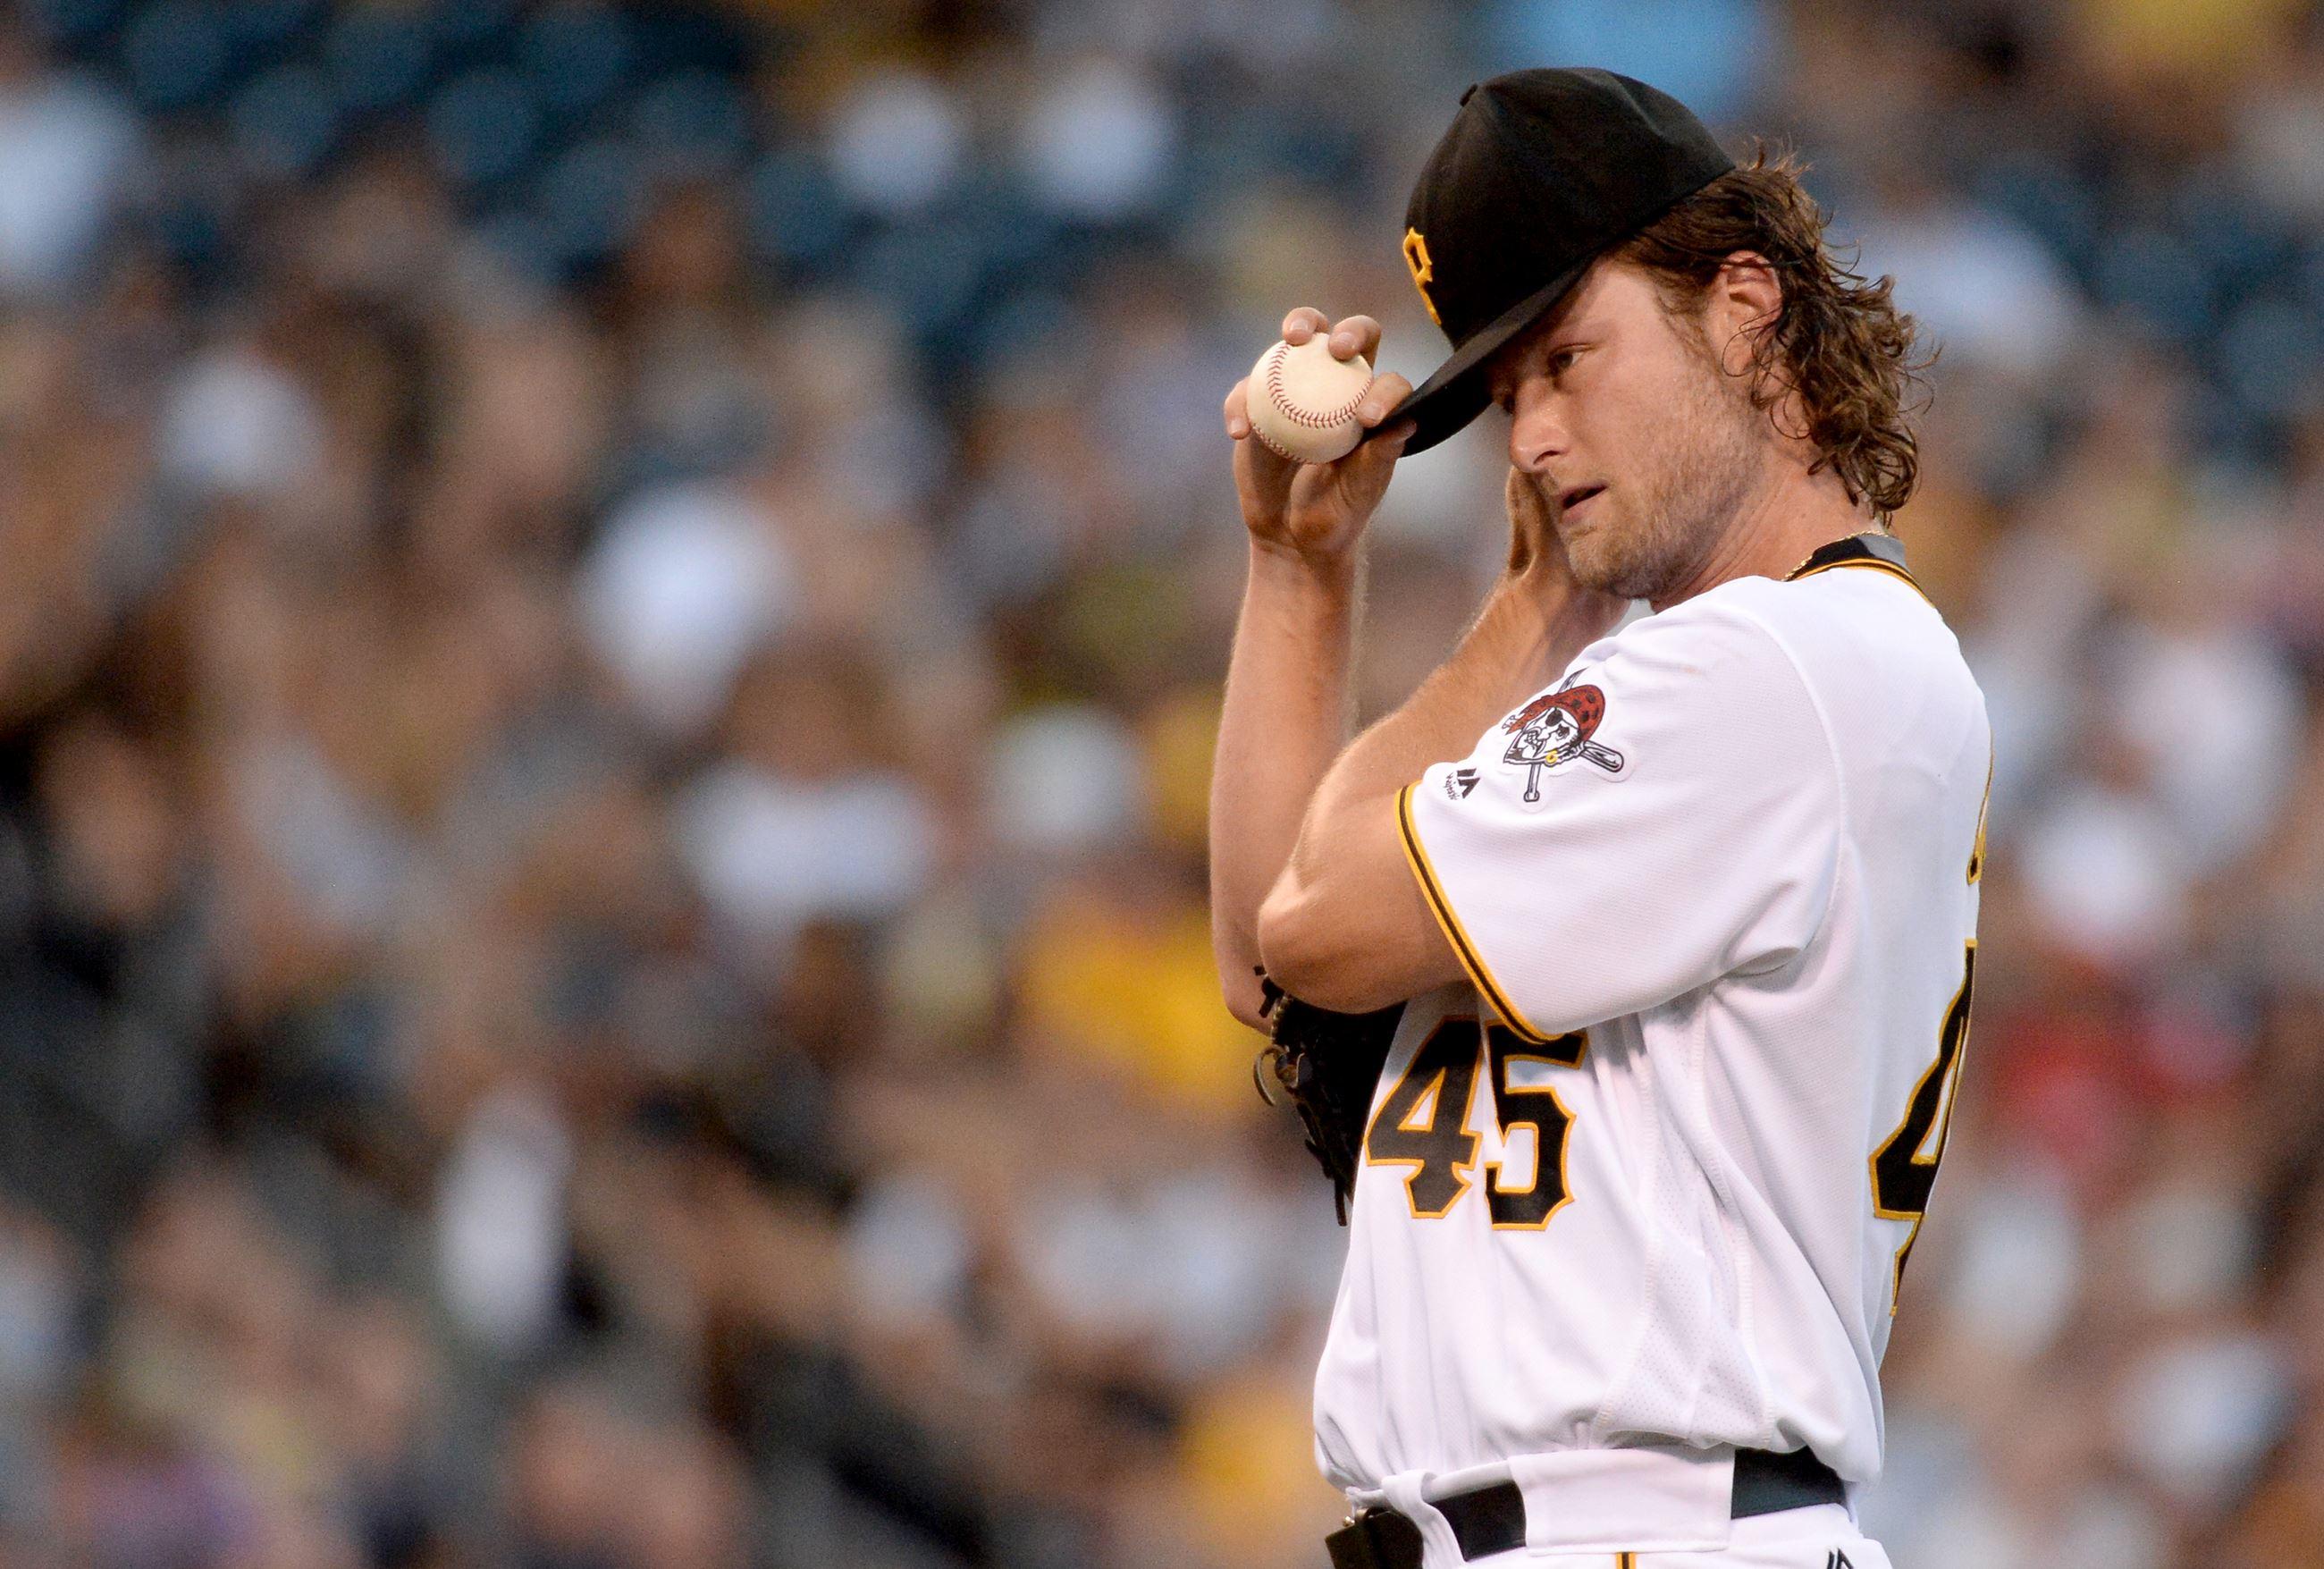 Pirates lose series opener to Marlins, 6-5